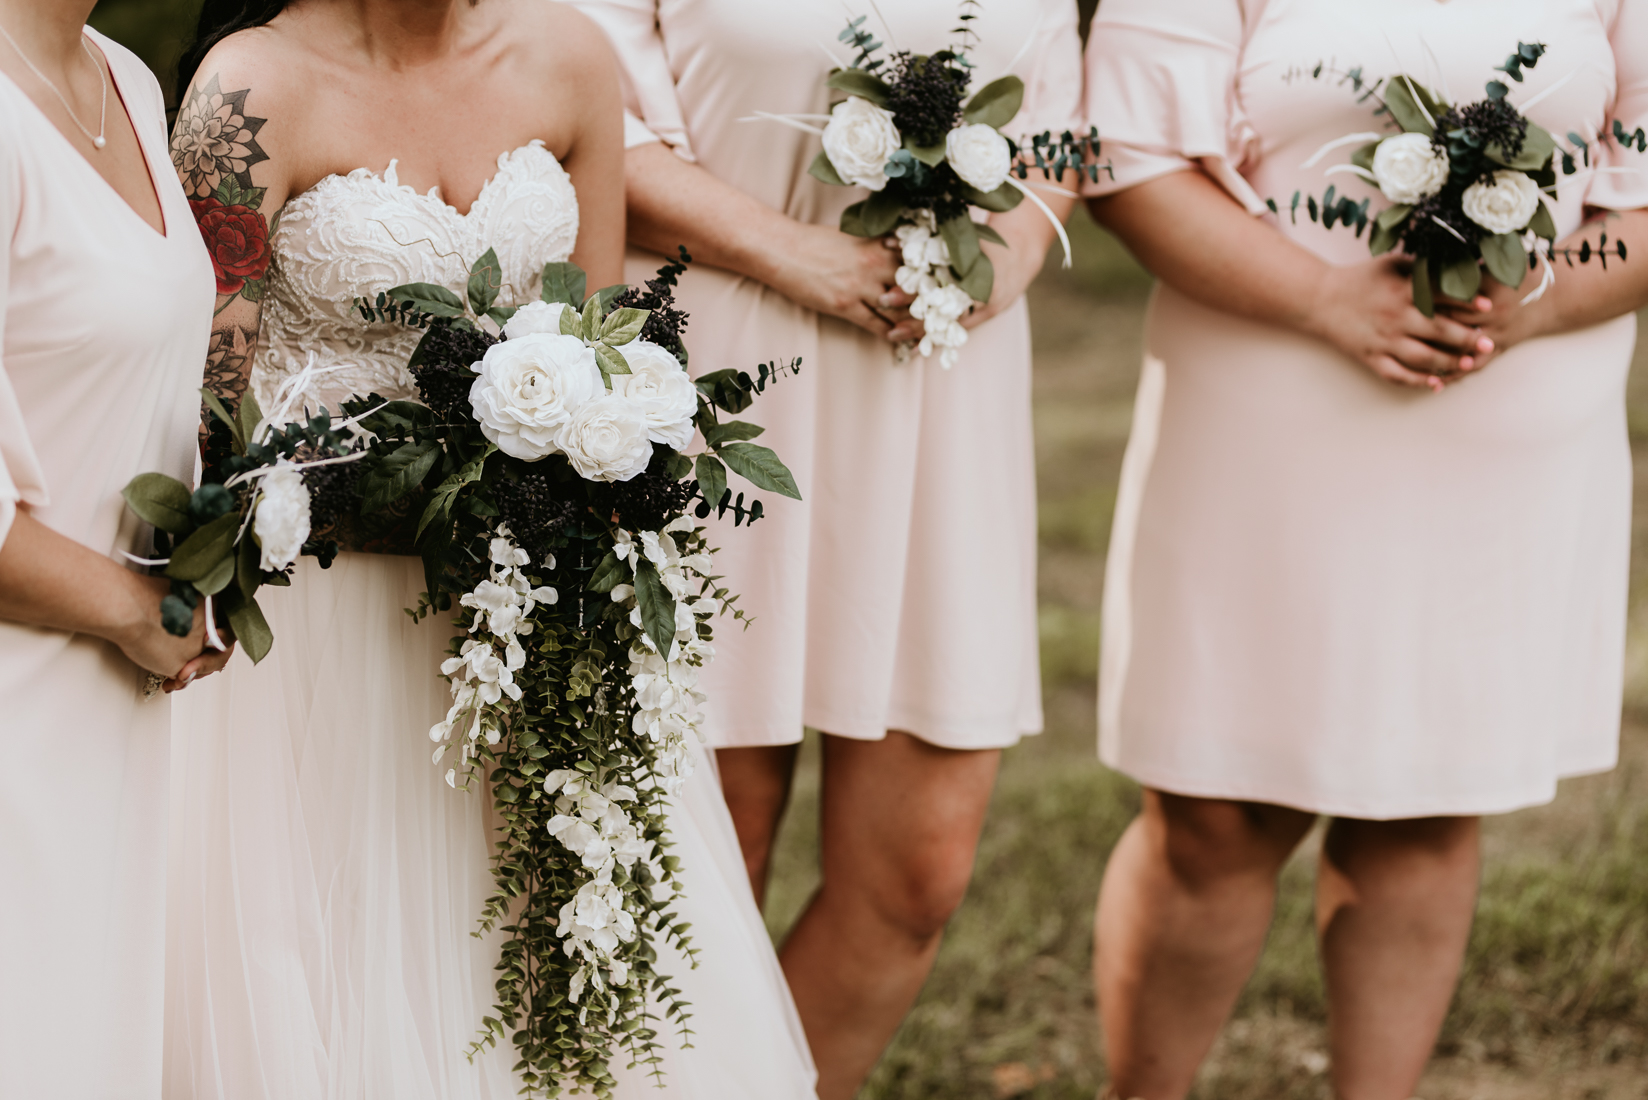 olivia_zay_wedding_09_2018-7488.jpg